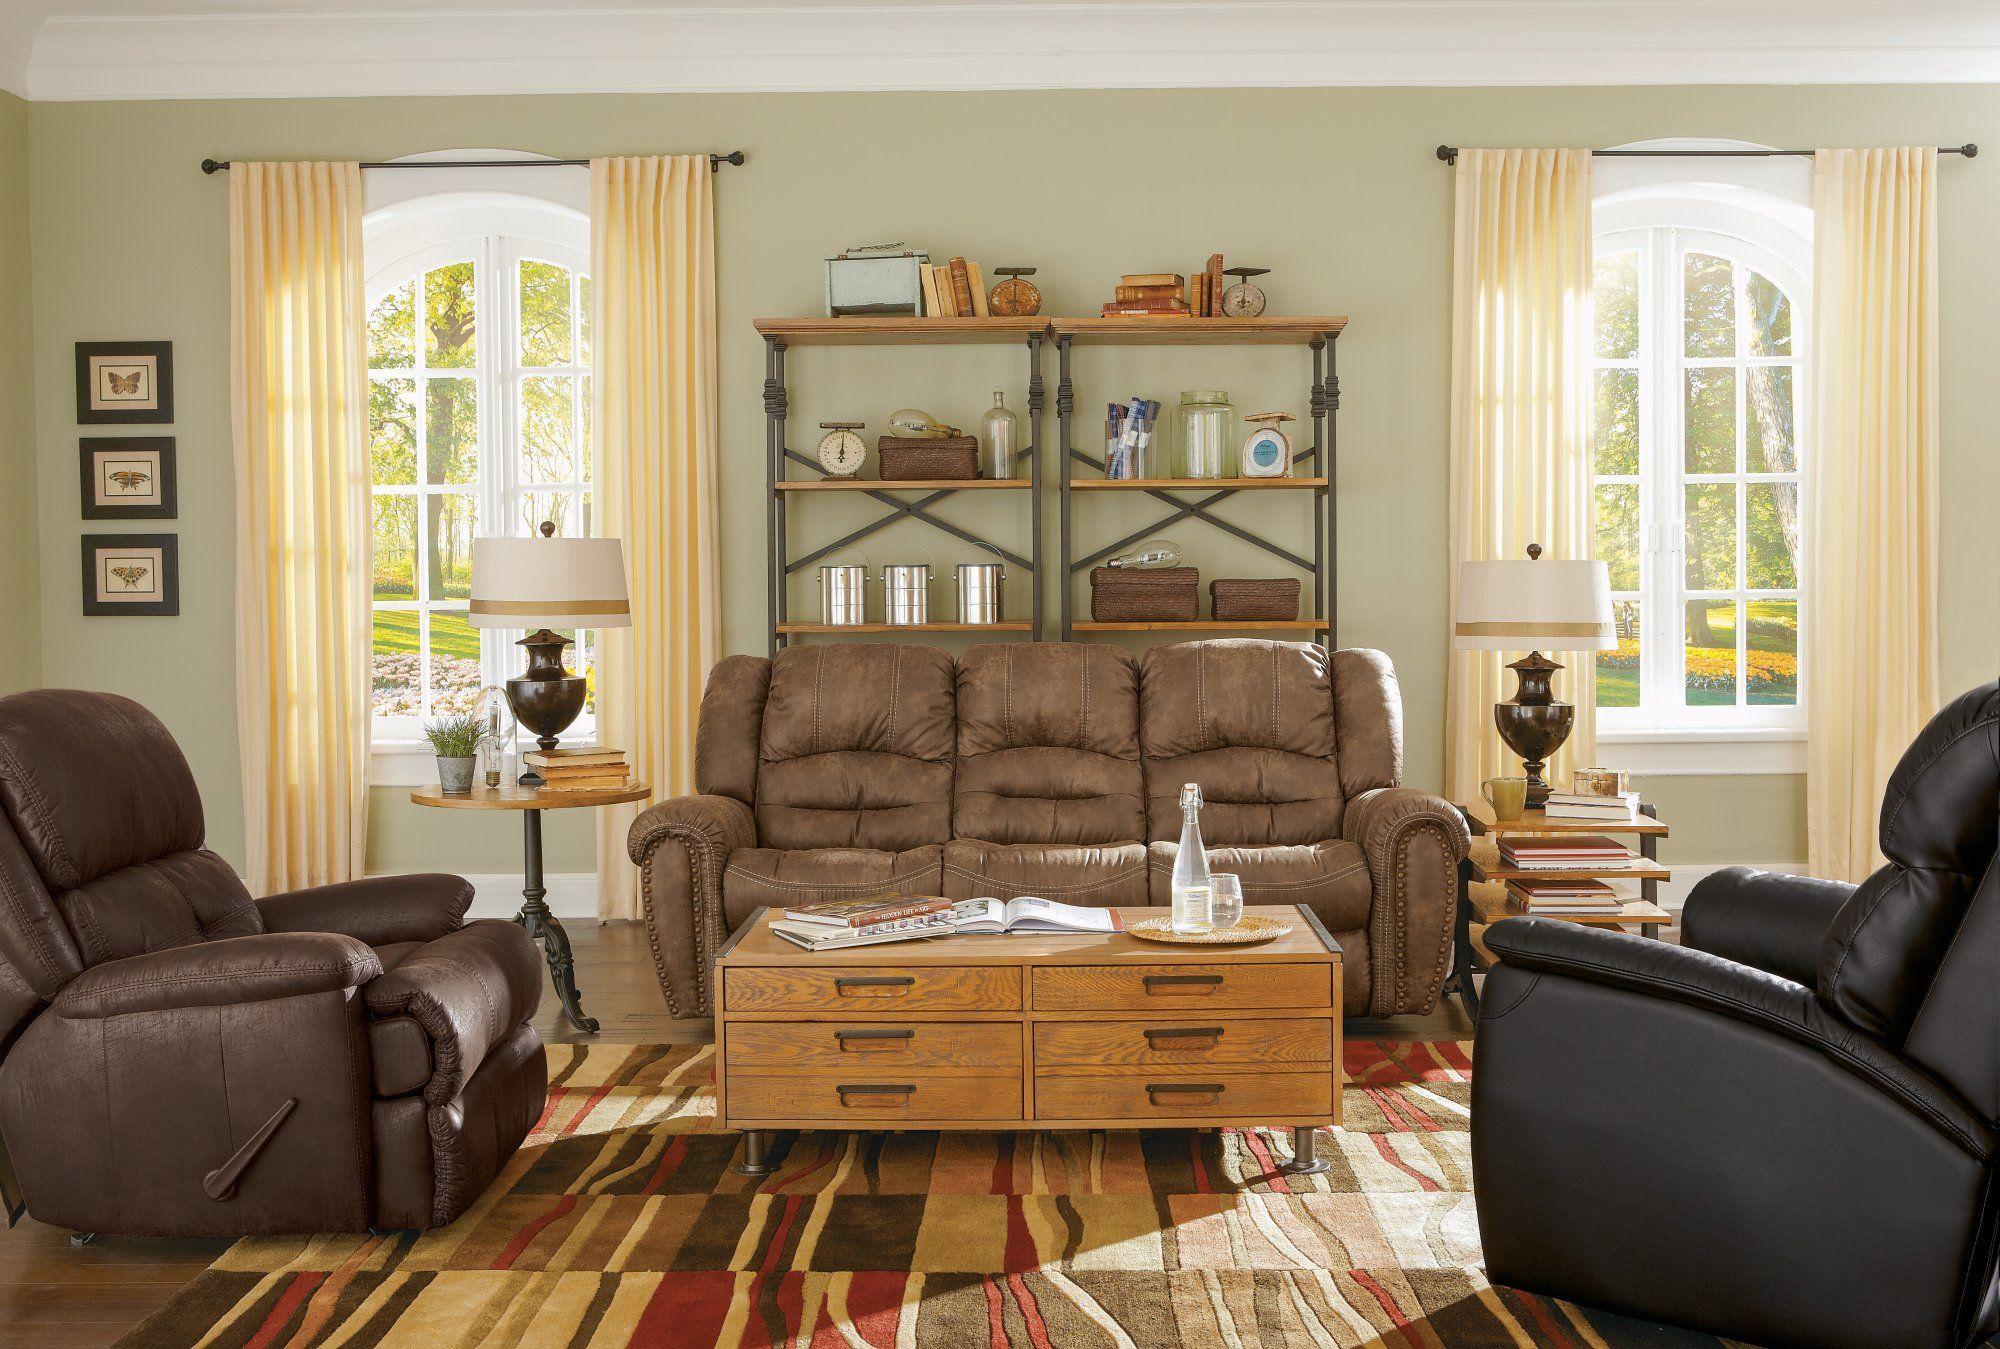 Quarles Furniture Store Springfield, Missouri Bolivar, Missouri in